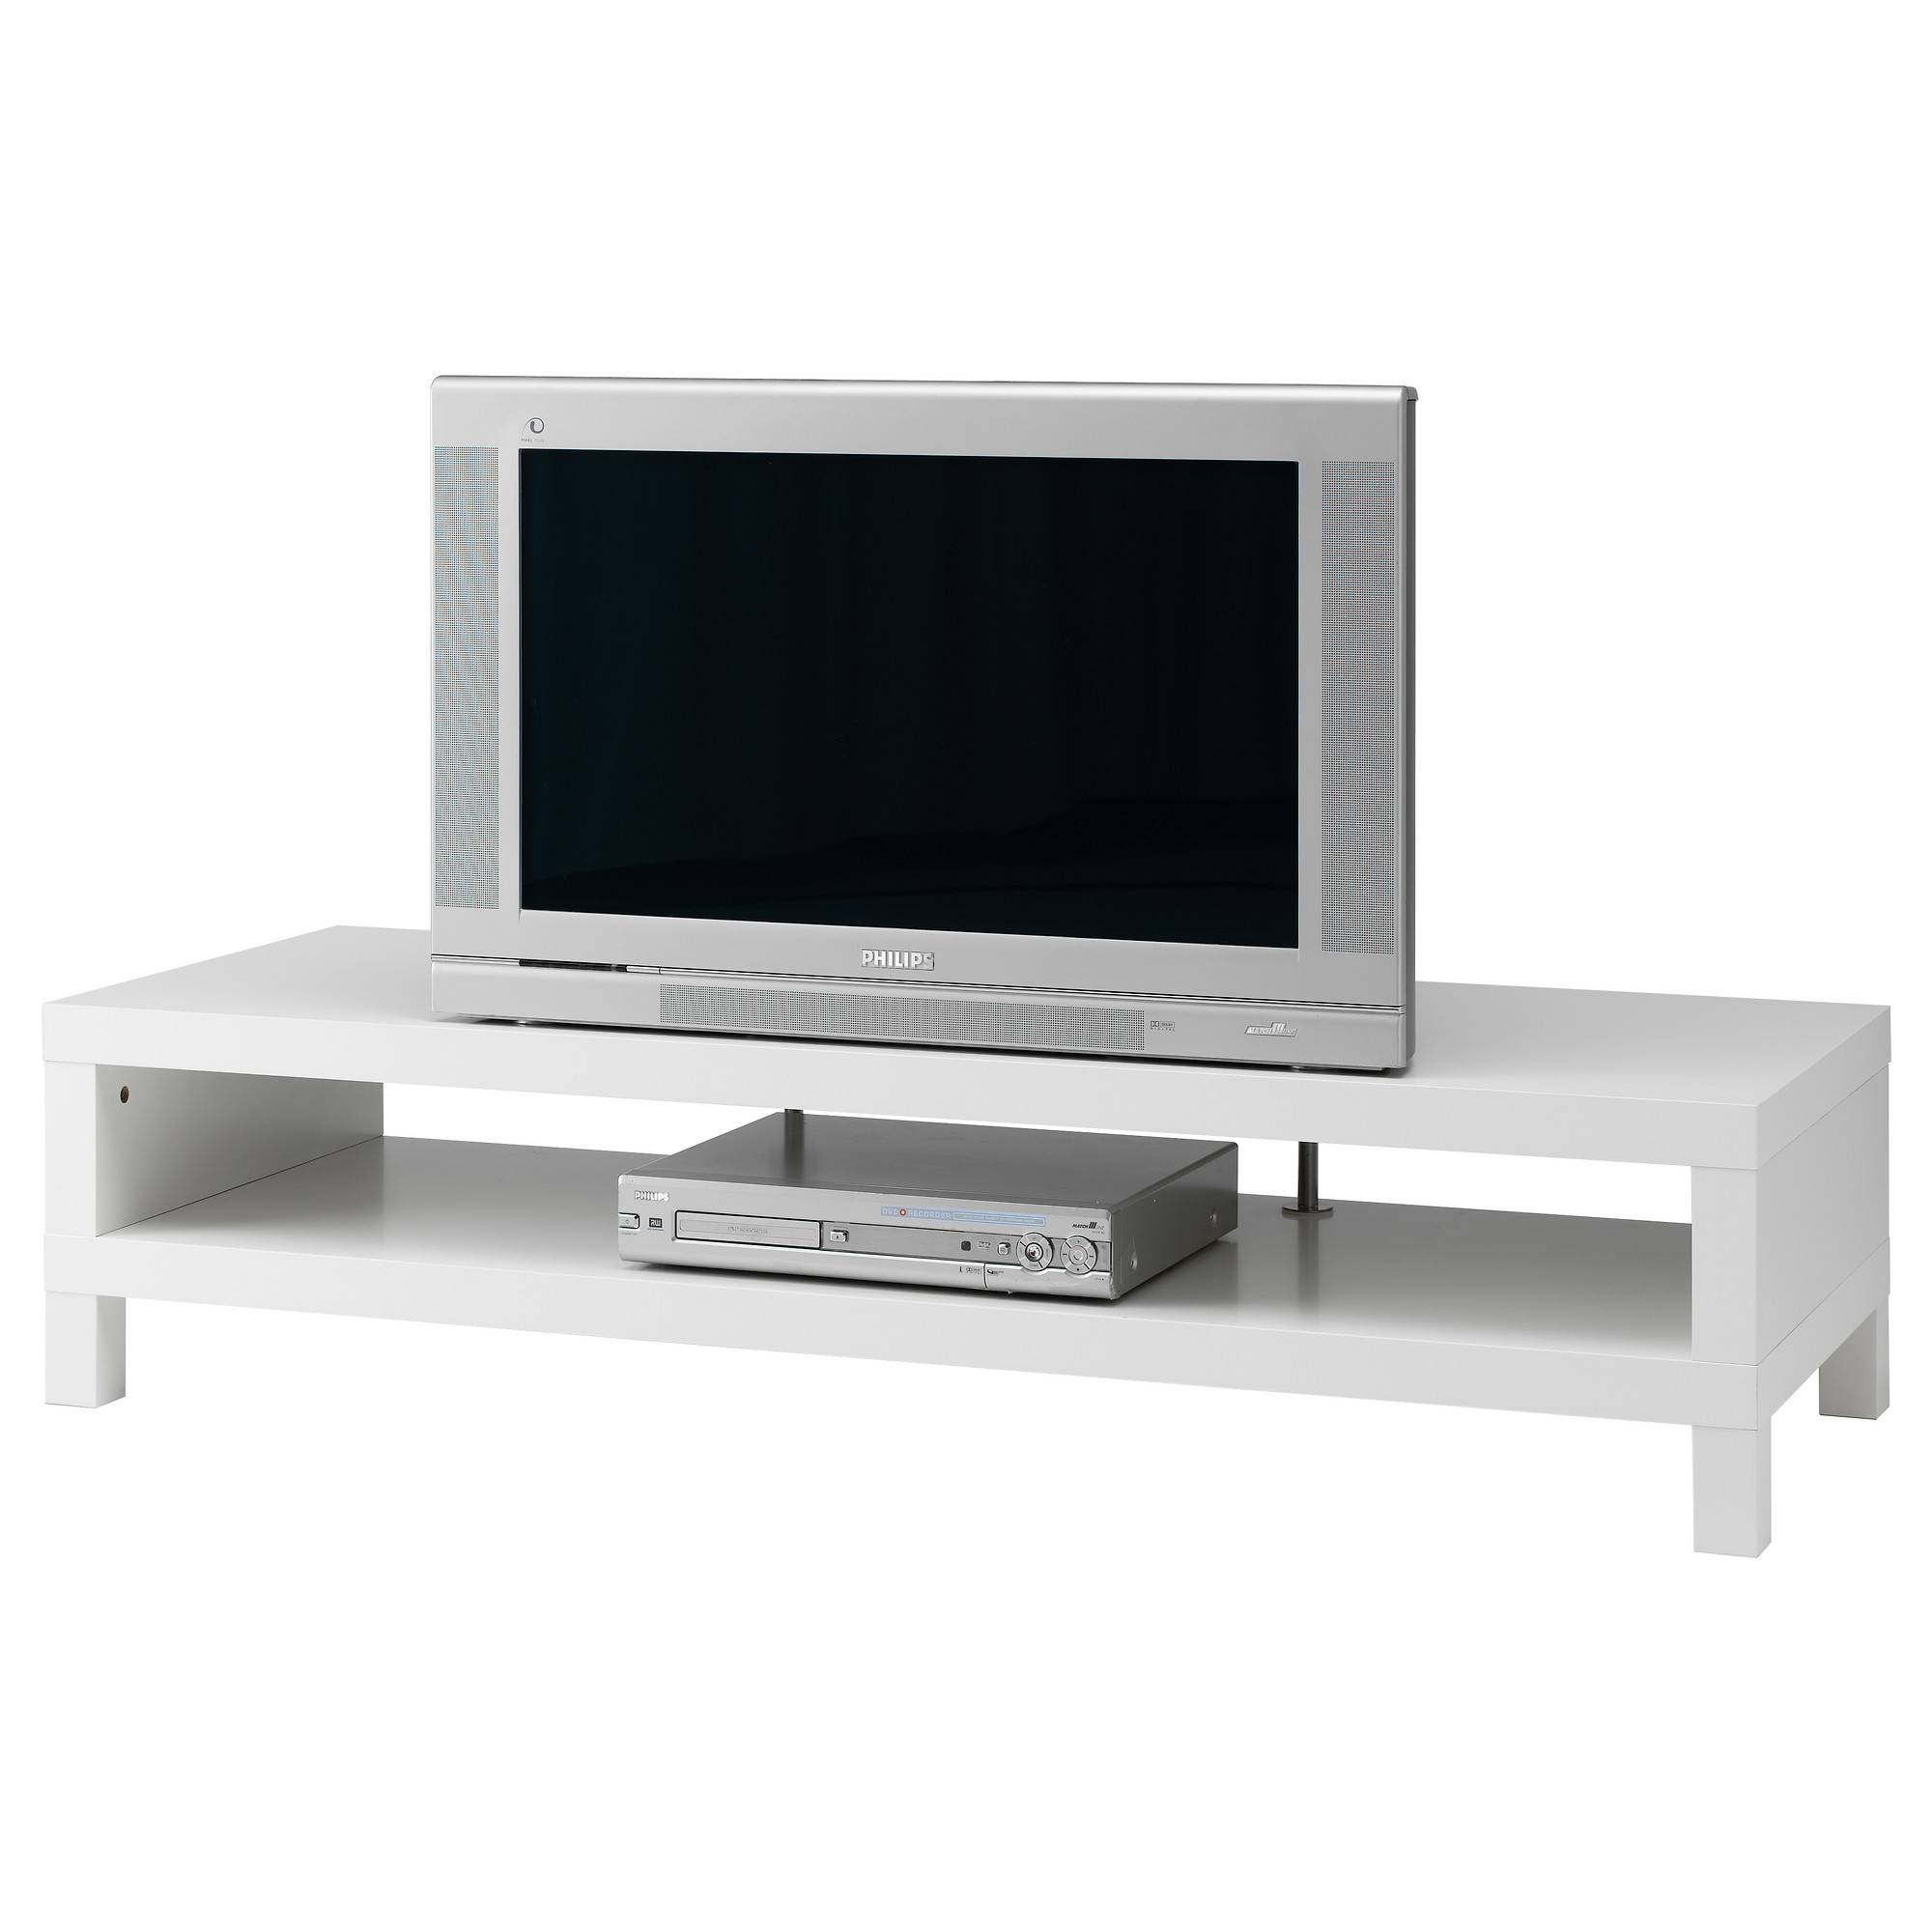 Lack Tv Bench White 149X55 Cm – Ikea With Corner Tv Unit White Gloss (View 5 of 15)